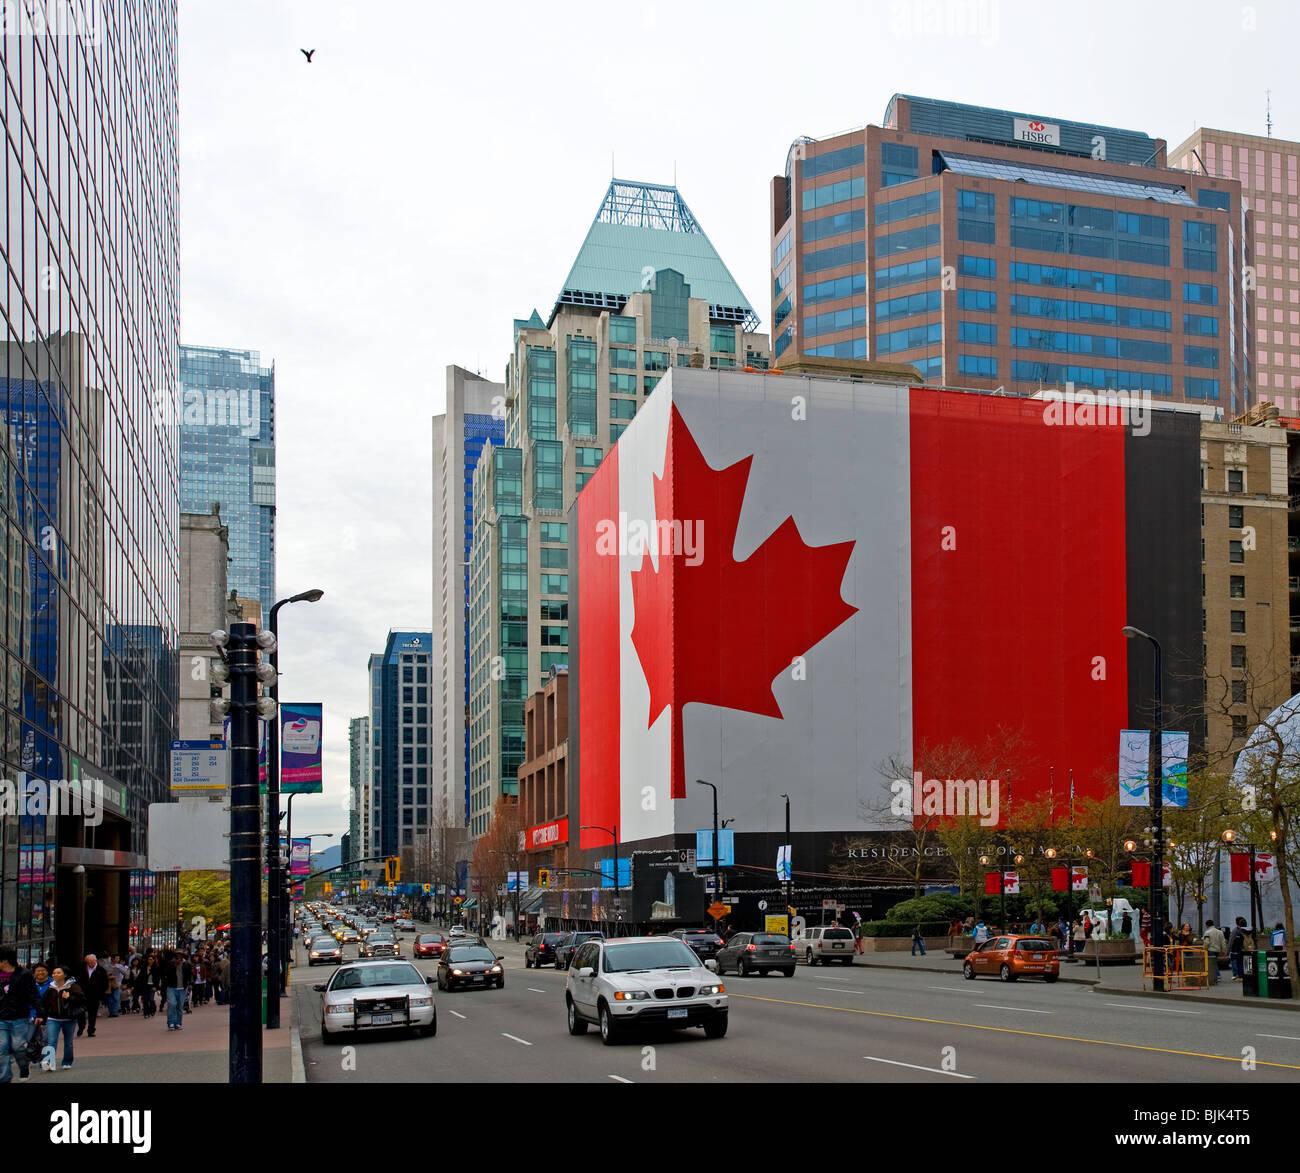 Vancouver Bc Canada: West Georgia Street Downtown Vancouver, BC Canada, With A